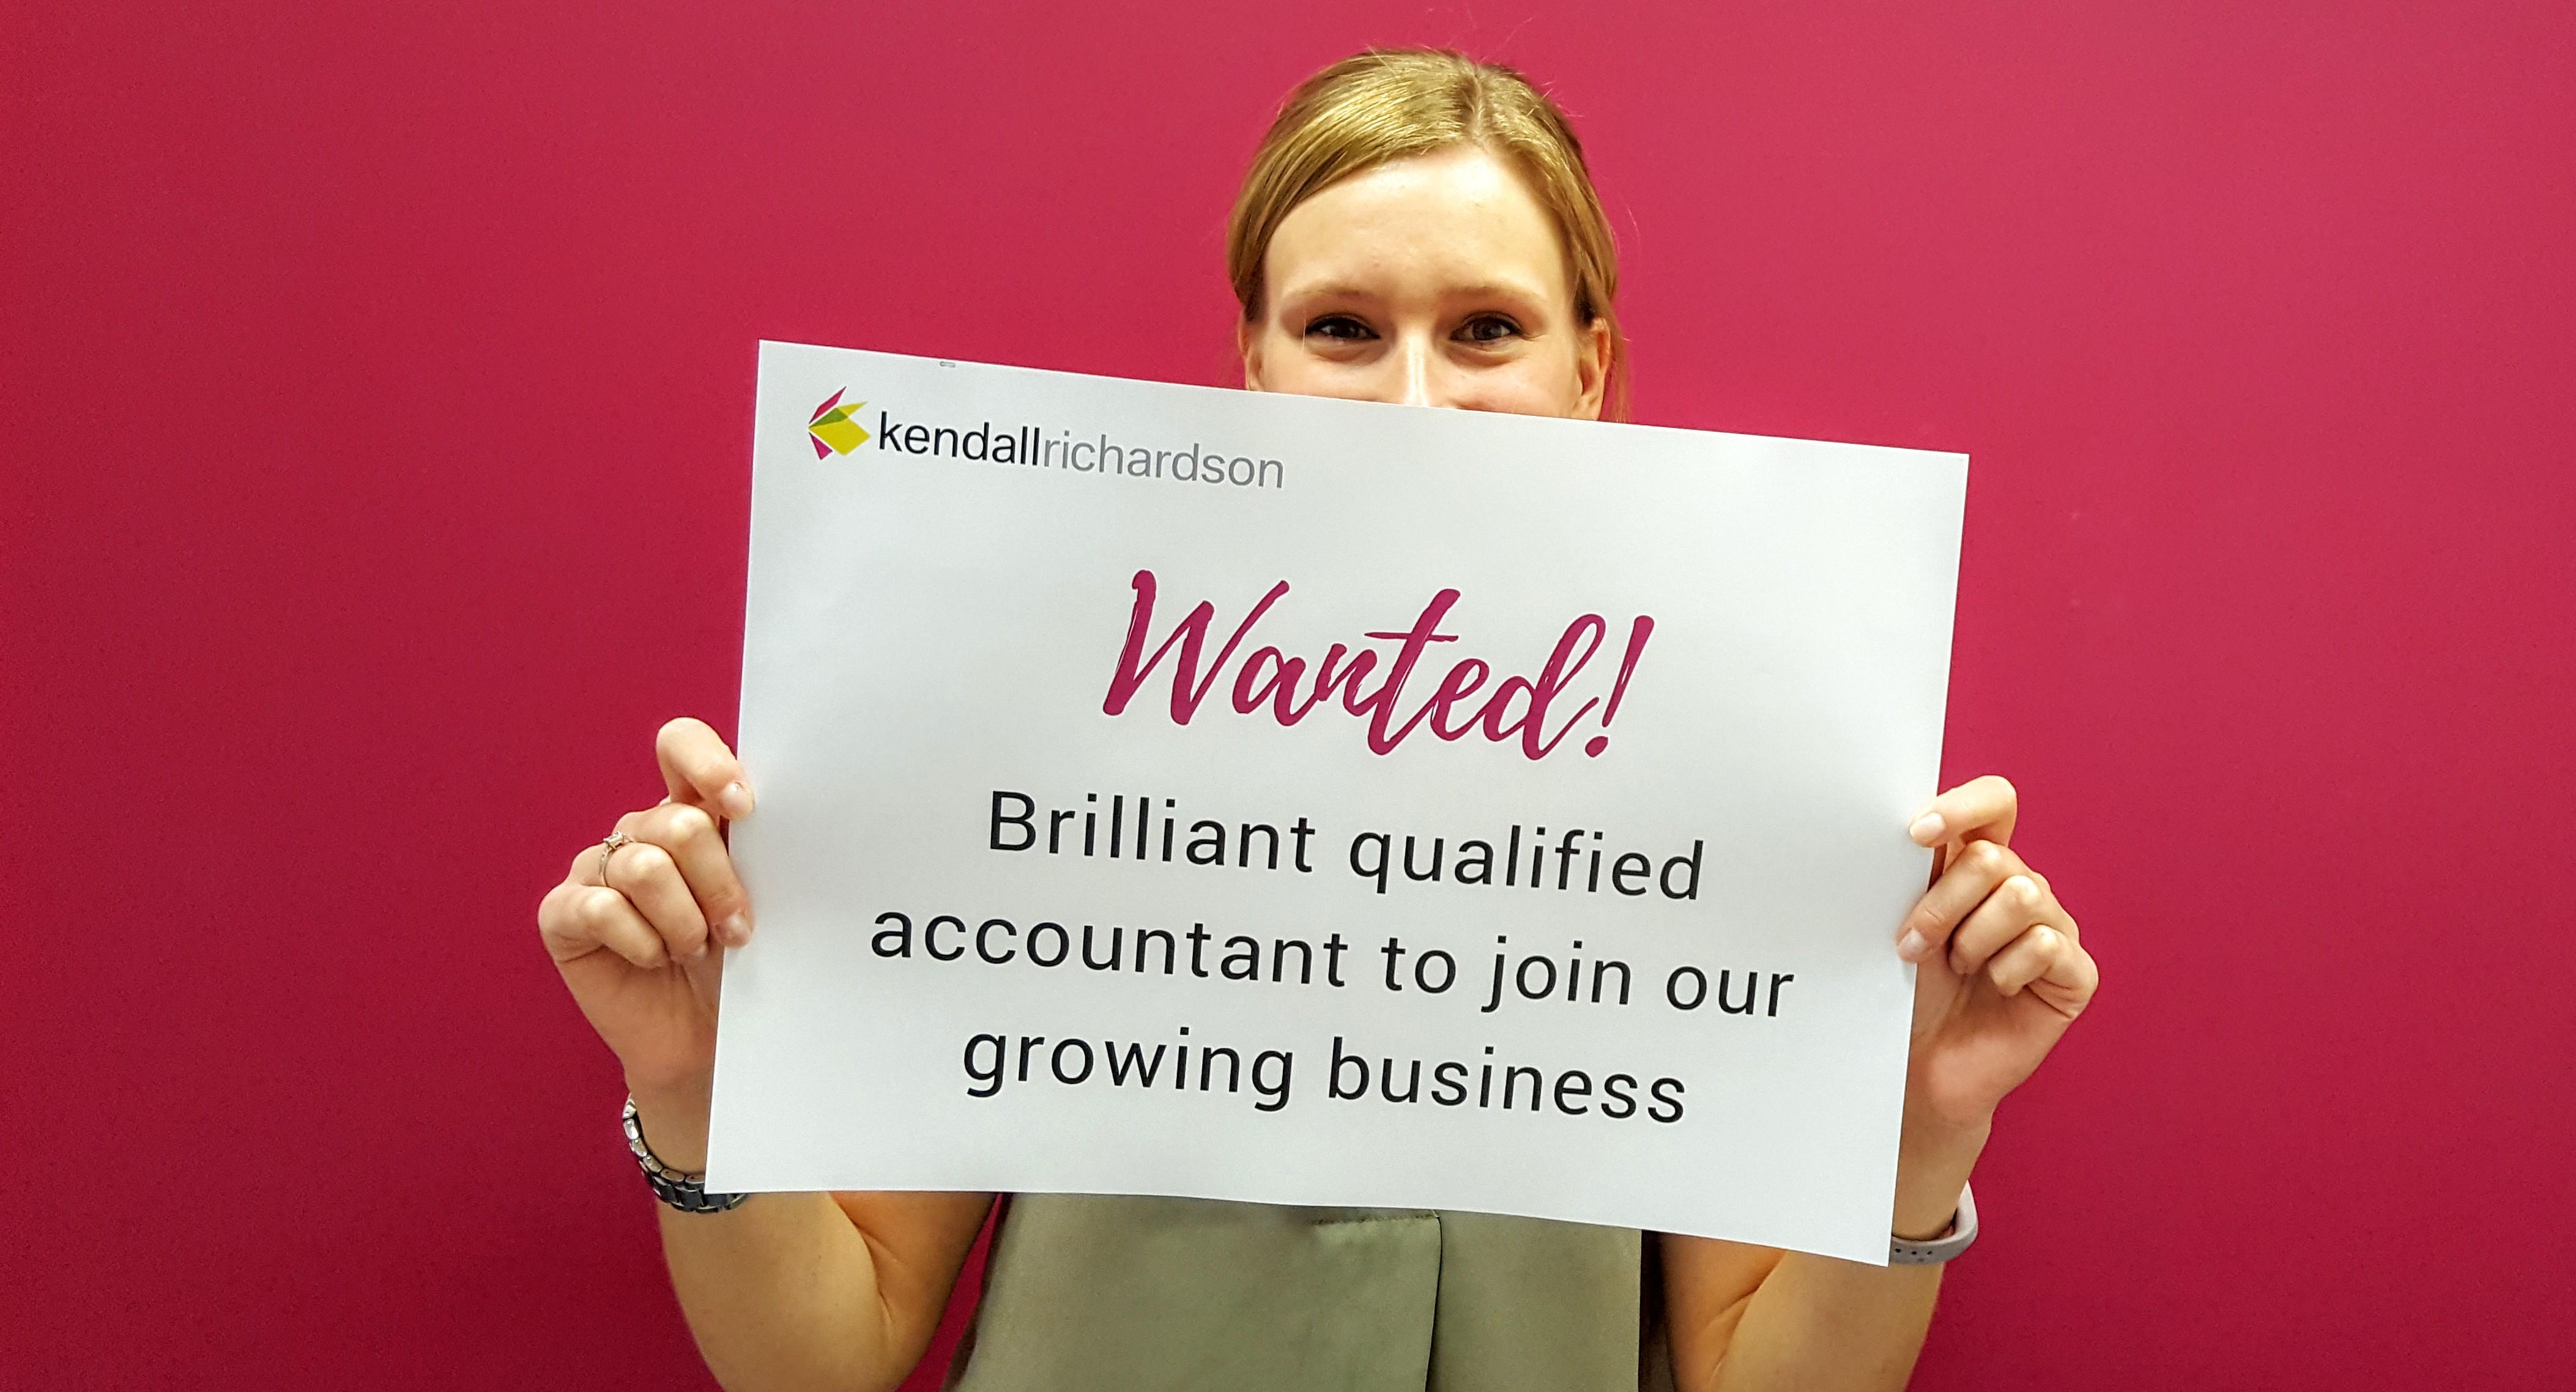 Kendall Richardson Accountancy and Bookeeeping Jobs